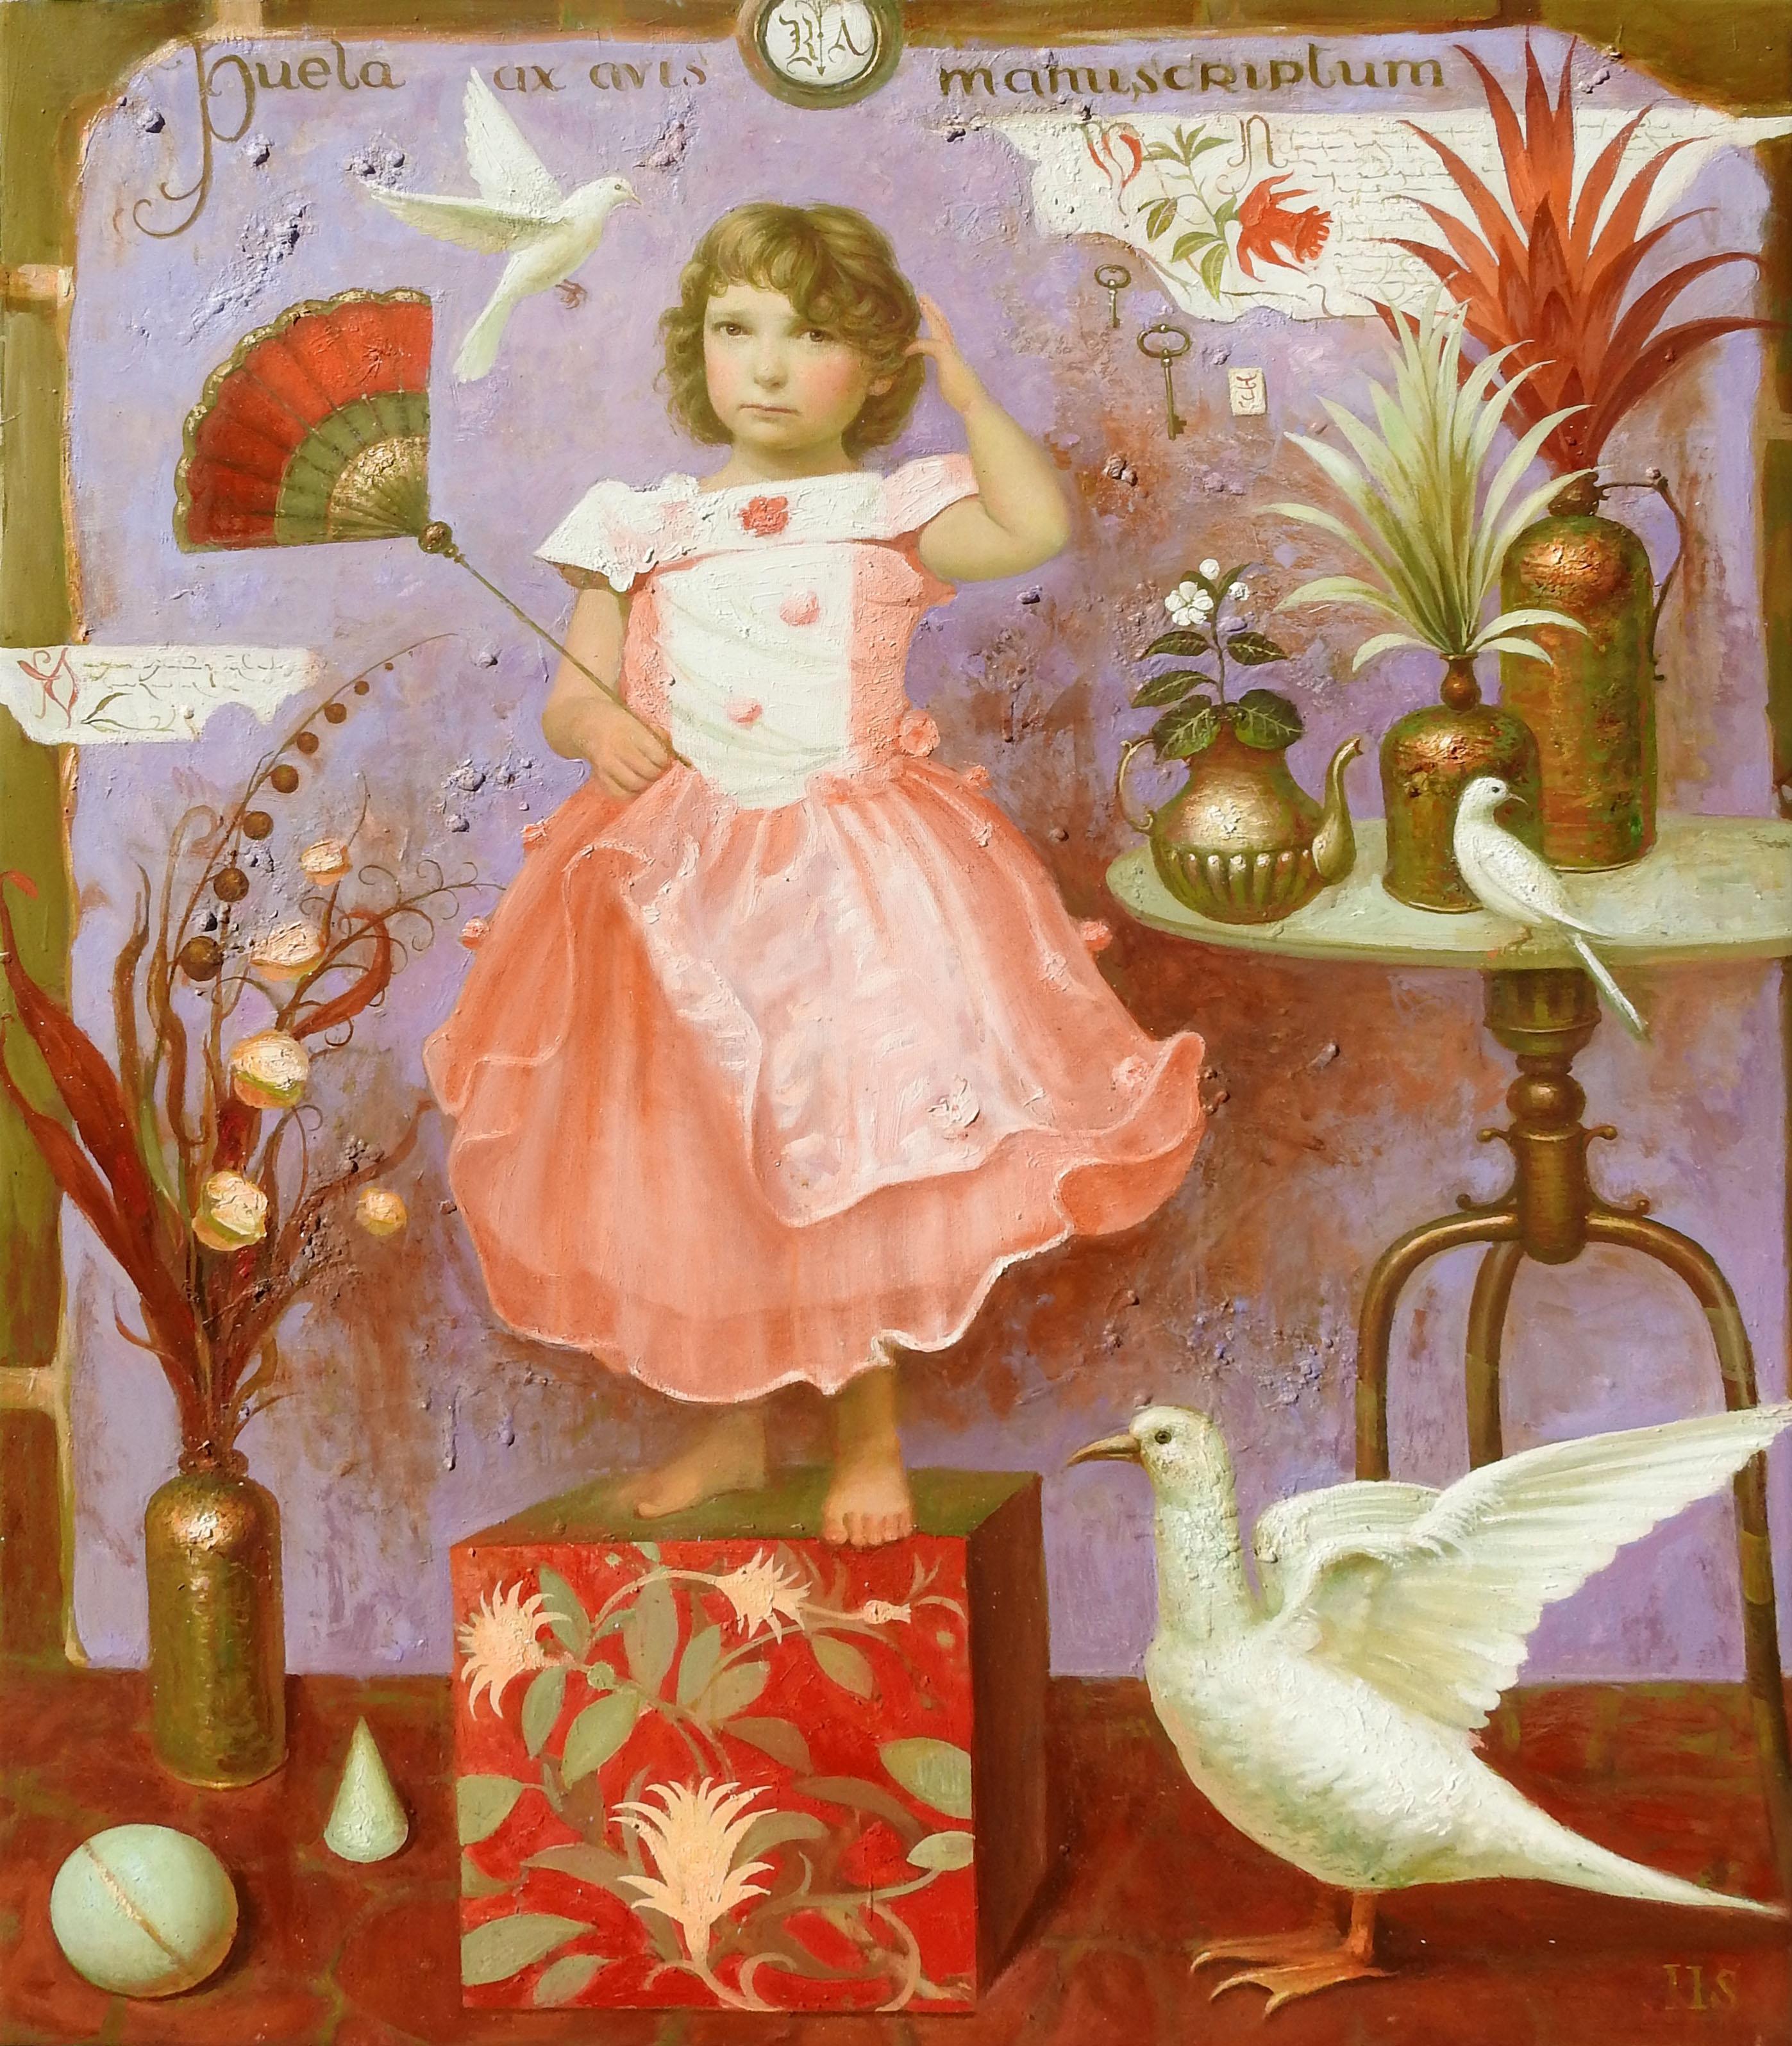 """The Child"", Igor Samsonov, Surrealism, Figurative, Original Oil, 46x37 in."